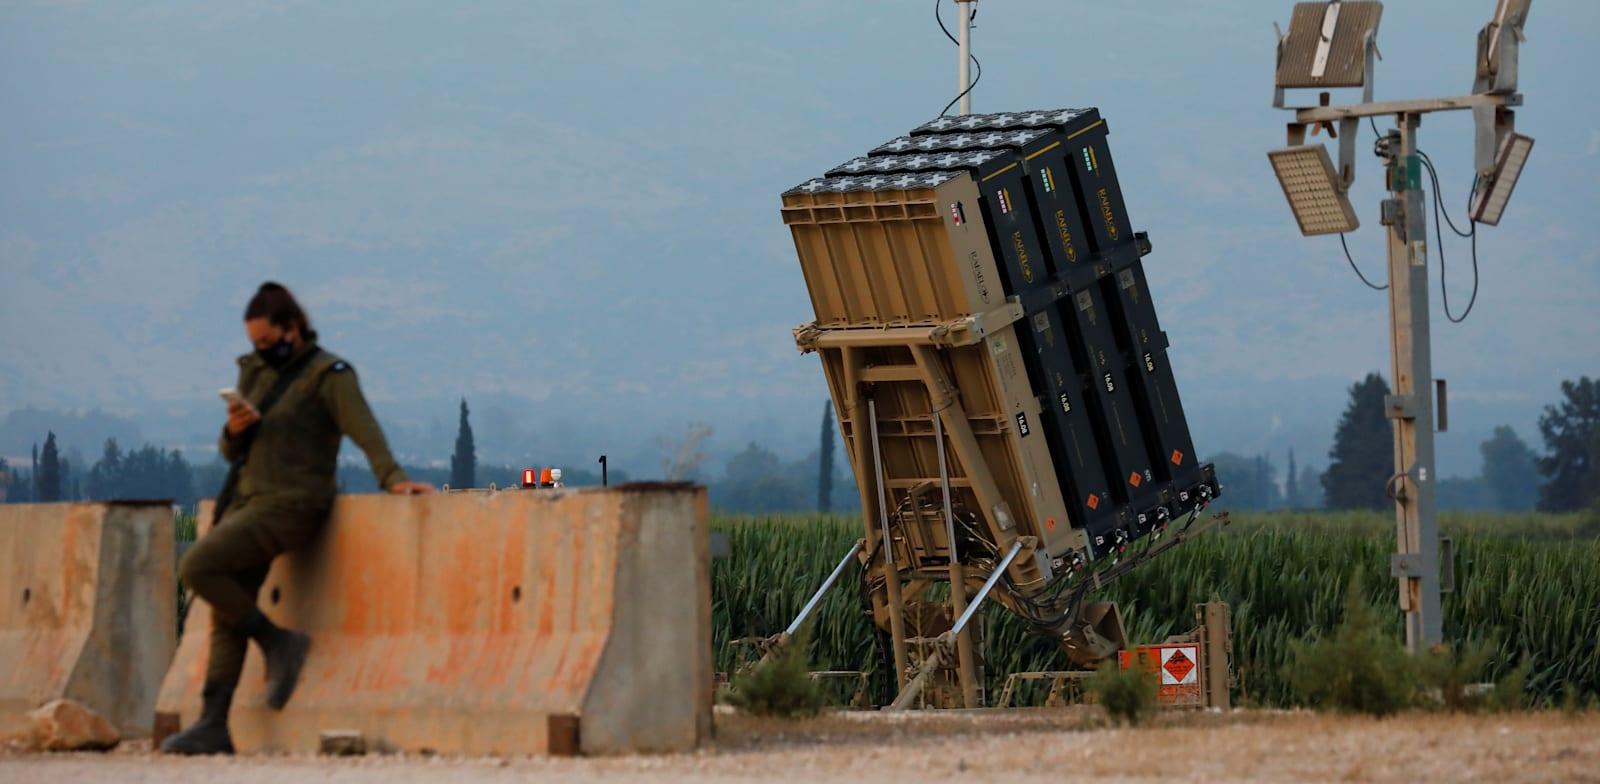 Iron Dome battery  credit: Amir Cohen, Reuters